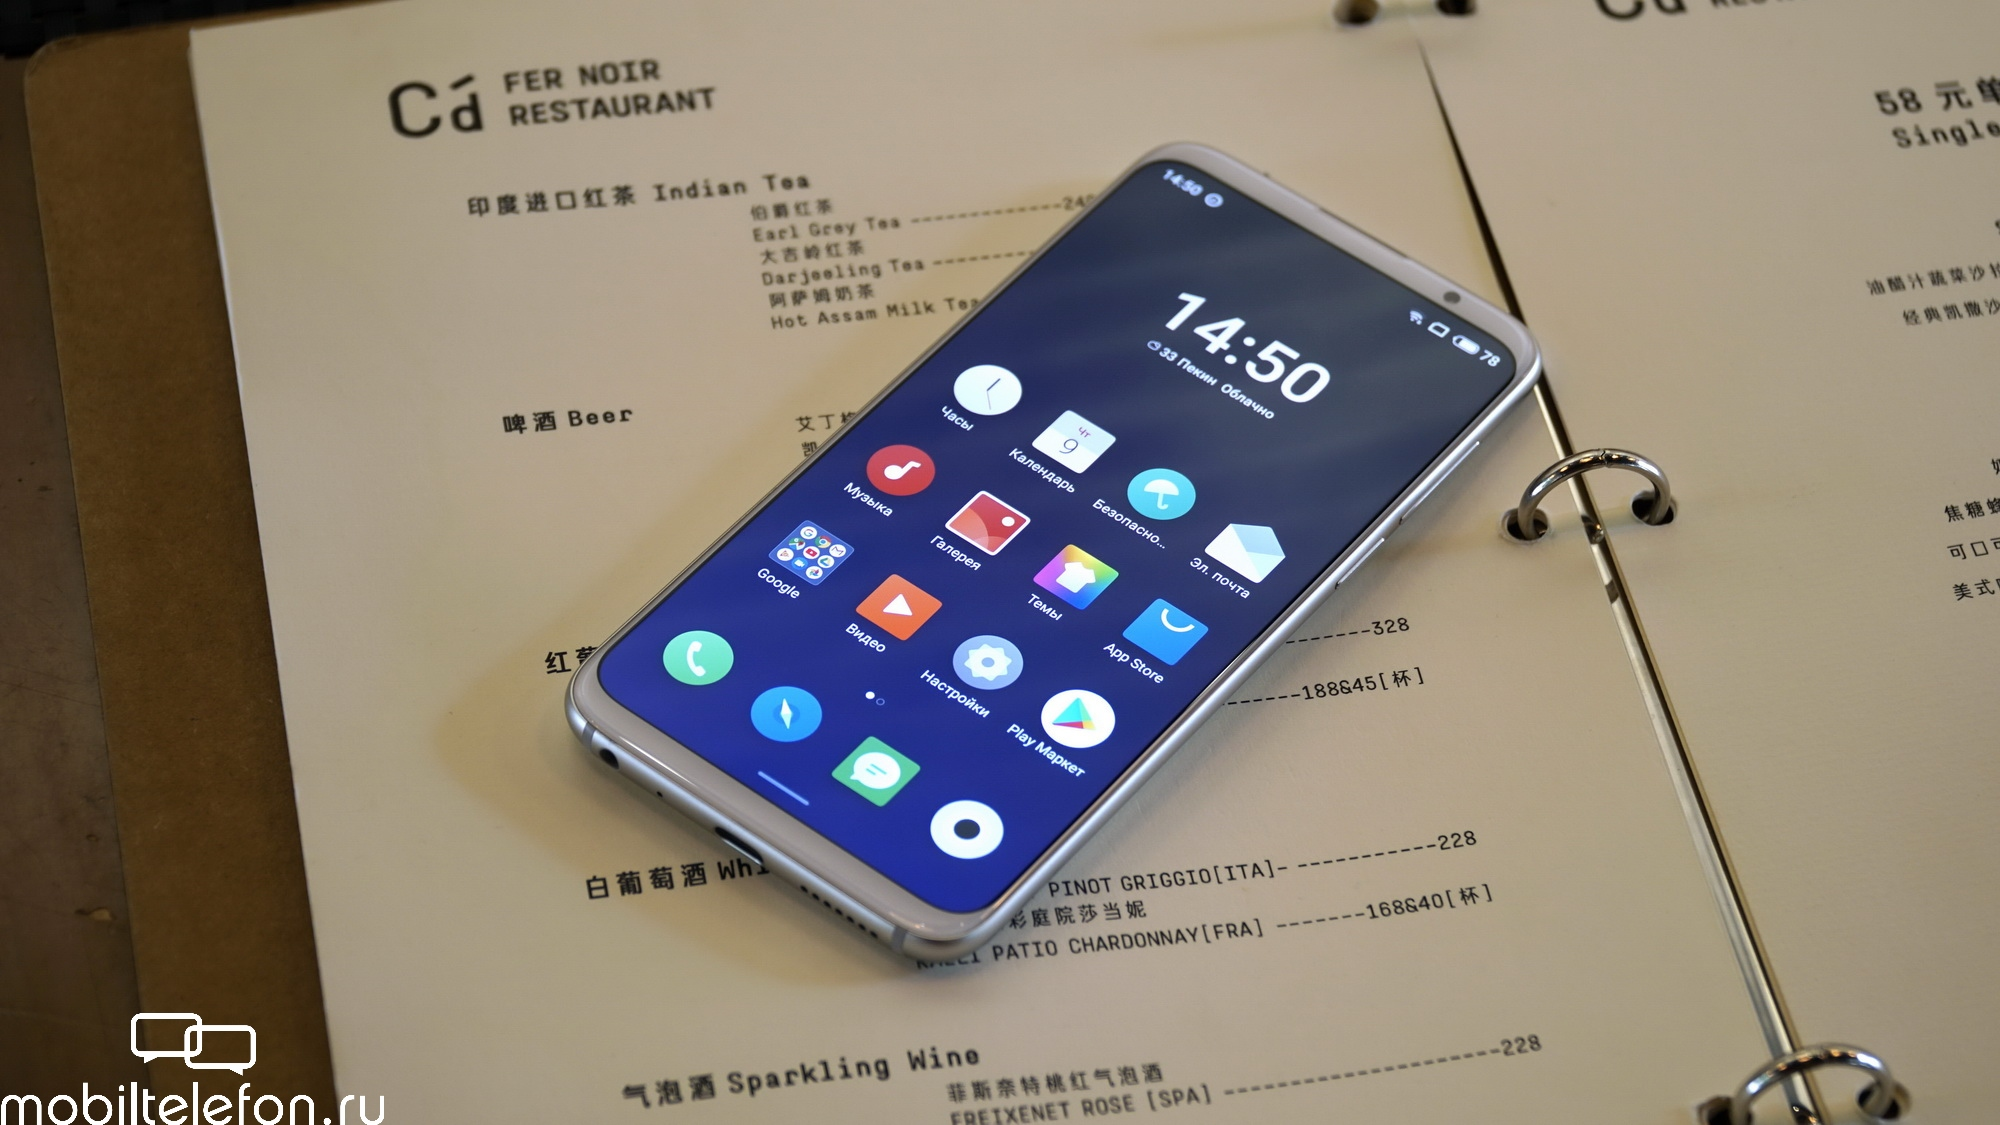 Meizu 17 - обзор, характеристики, отзывы, цены